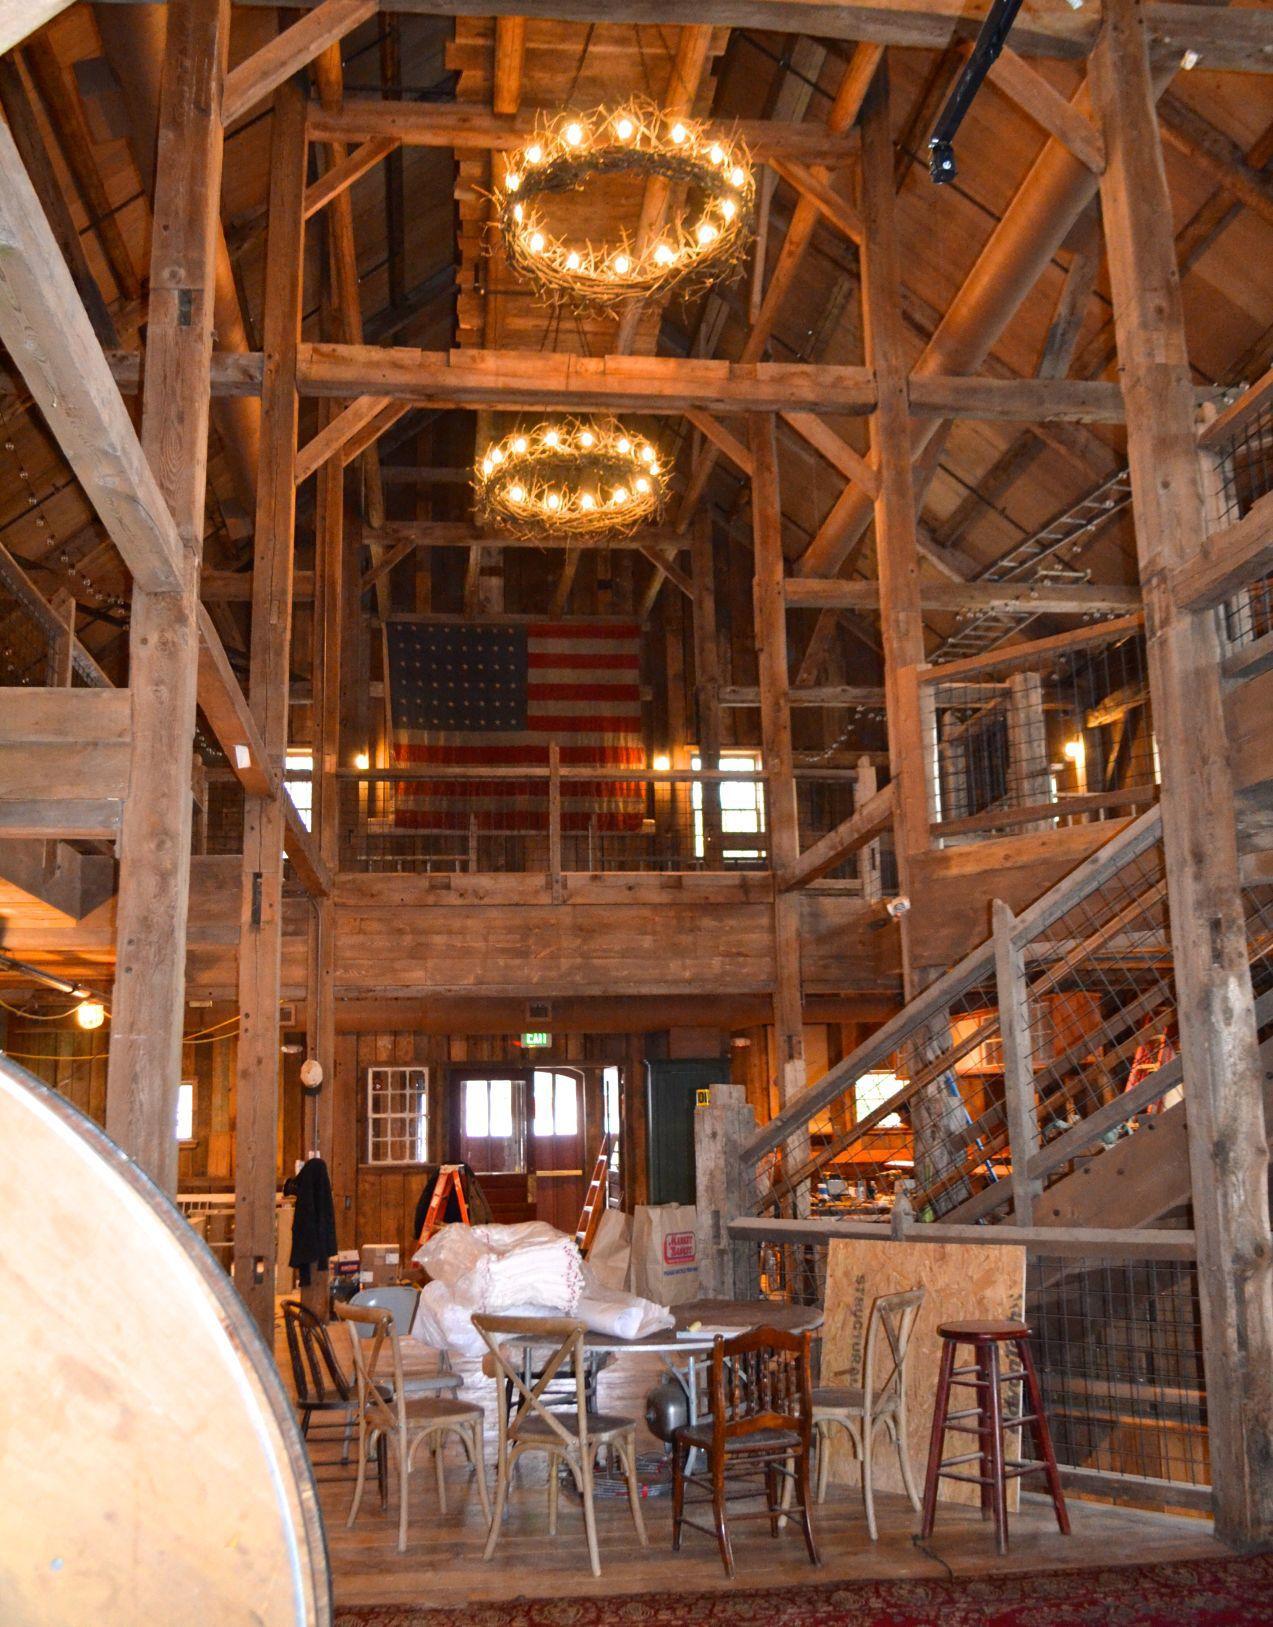 The barn under reconstruction